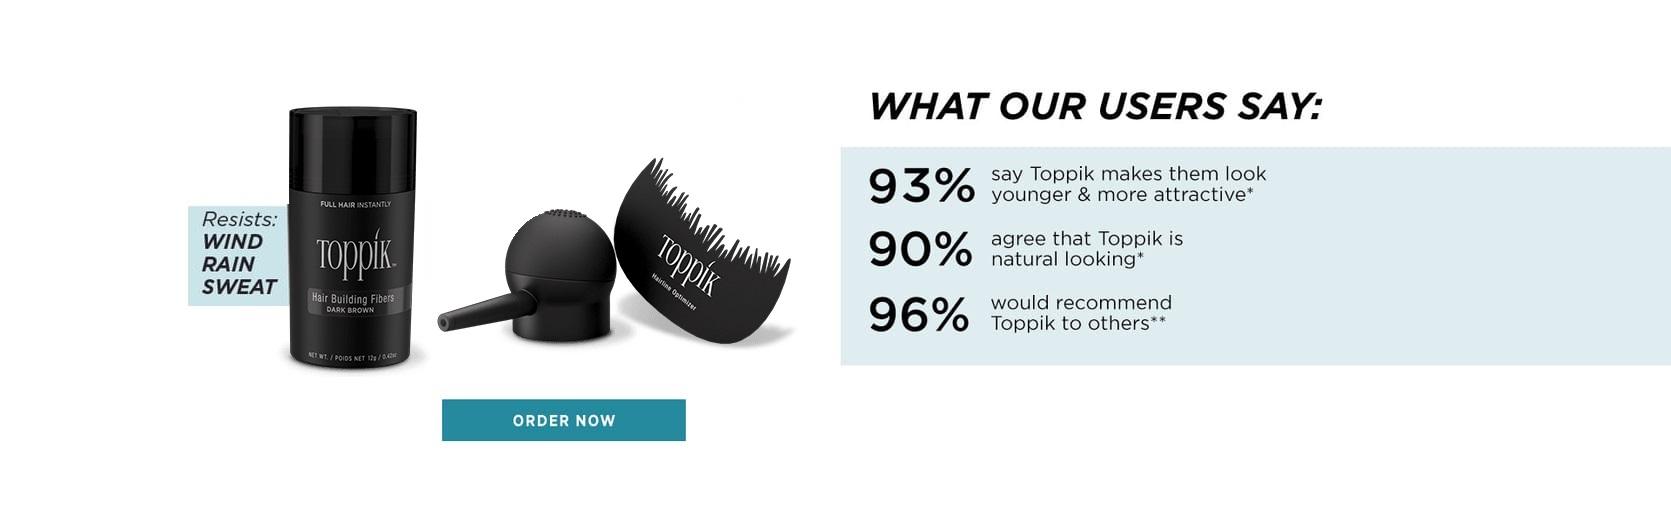 Toppik hair volume products Hair Building Fibers resists wind rain sweat - plus tools Spray Applicator and Hairline Optimizer